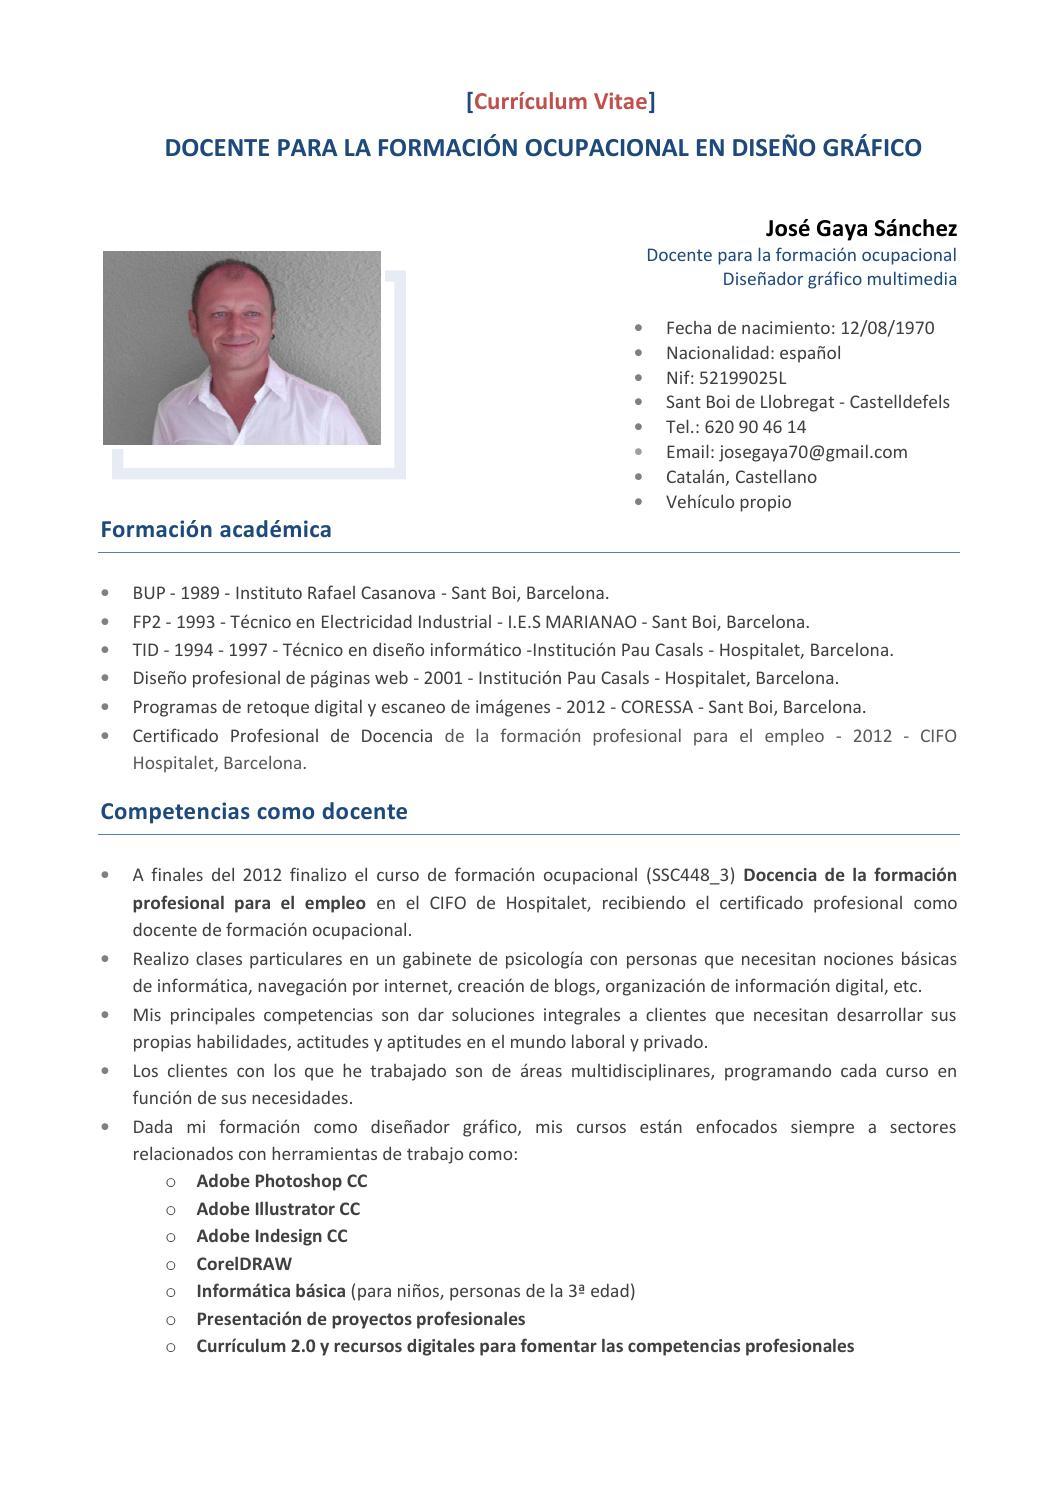 Curriculum Vitae by Jose Gaya - issuu